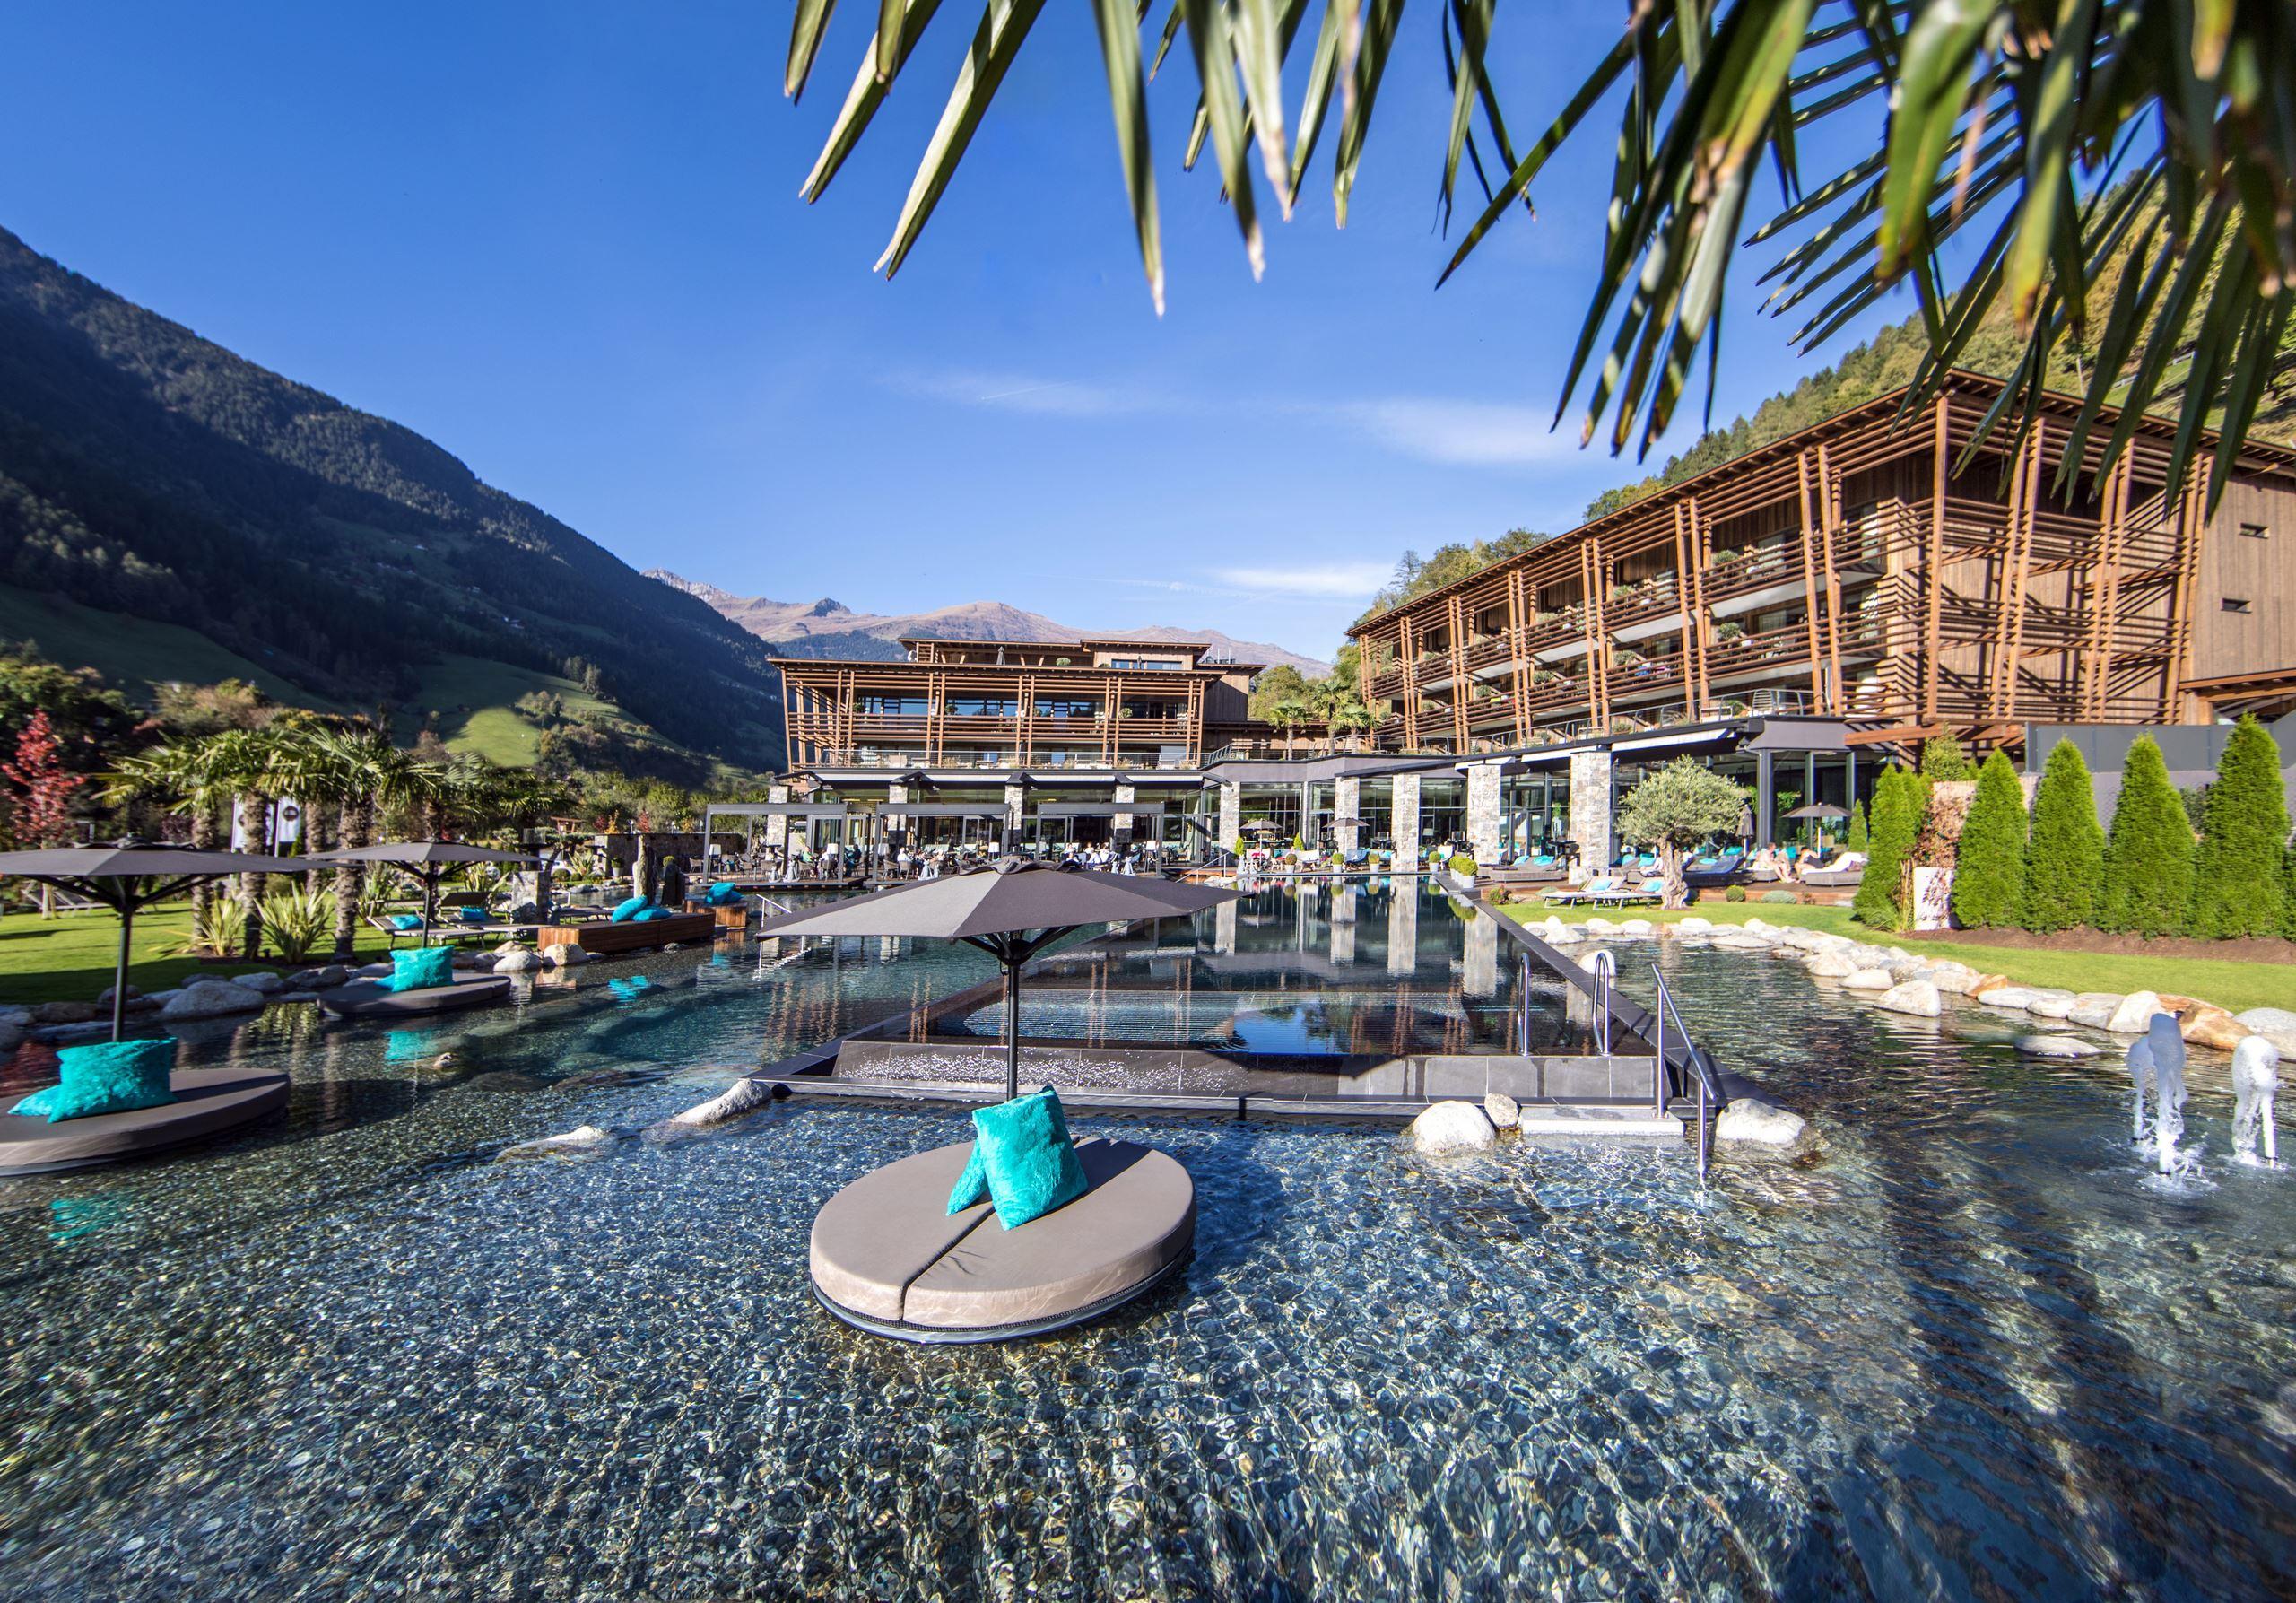 5 Sterne Wellnesshotels In Sudtirol Bei Meran Andreus Resorts